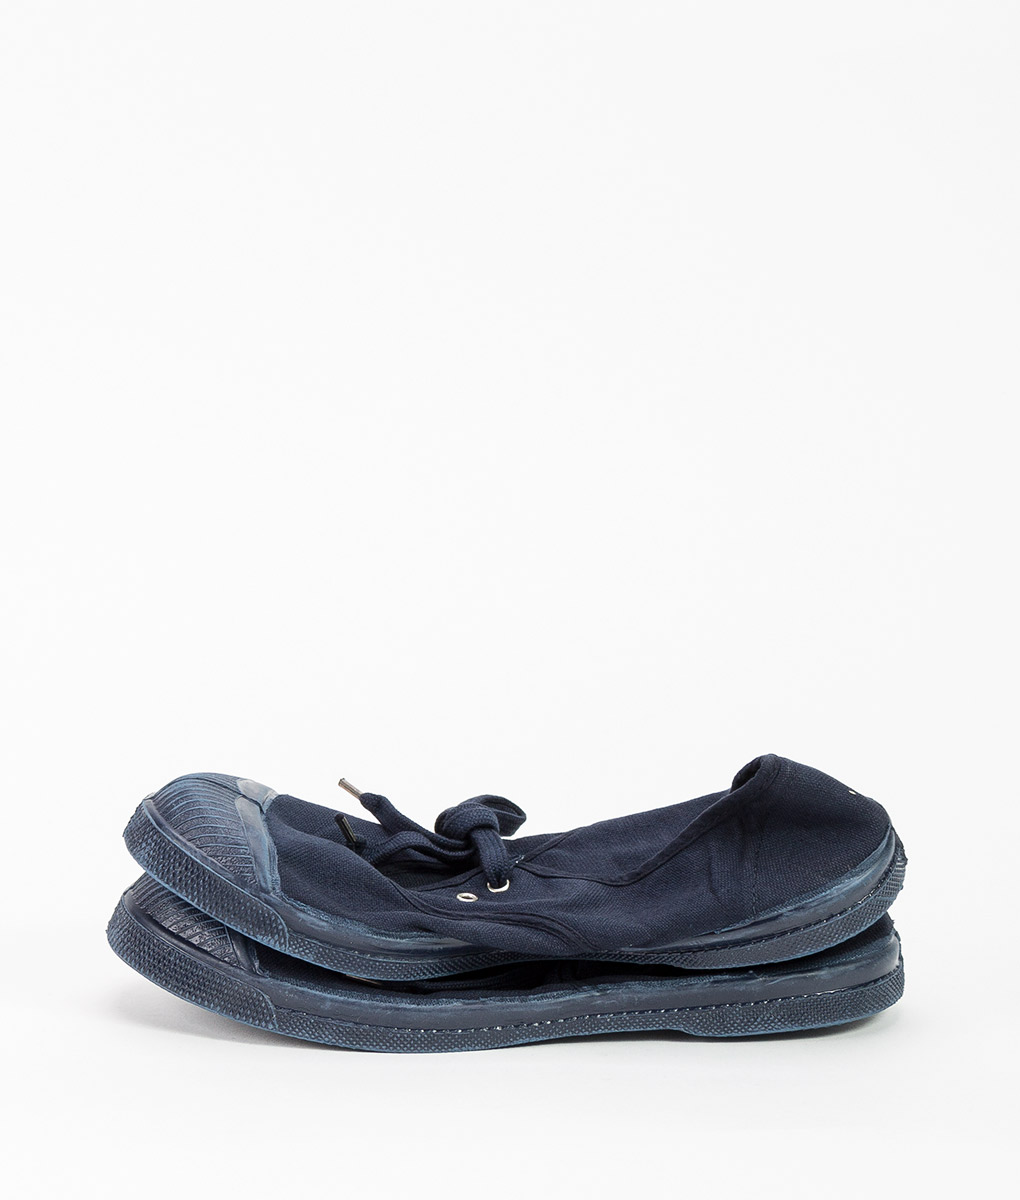 BENSIMON Women Sneakers 0516 COLORSOLE Navy 44.99